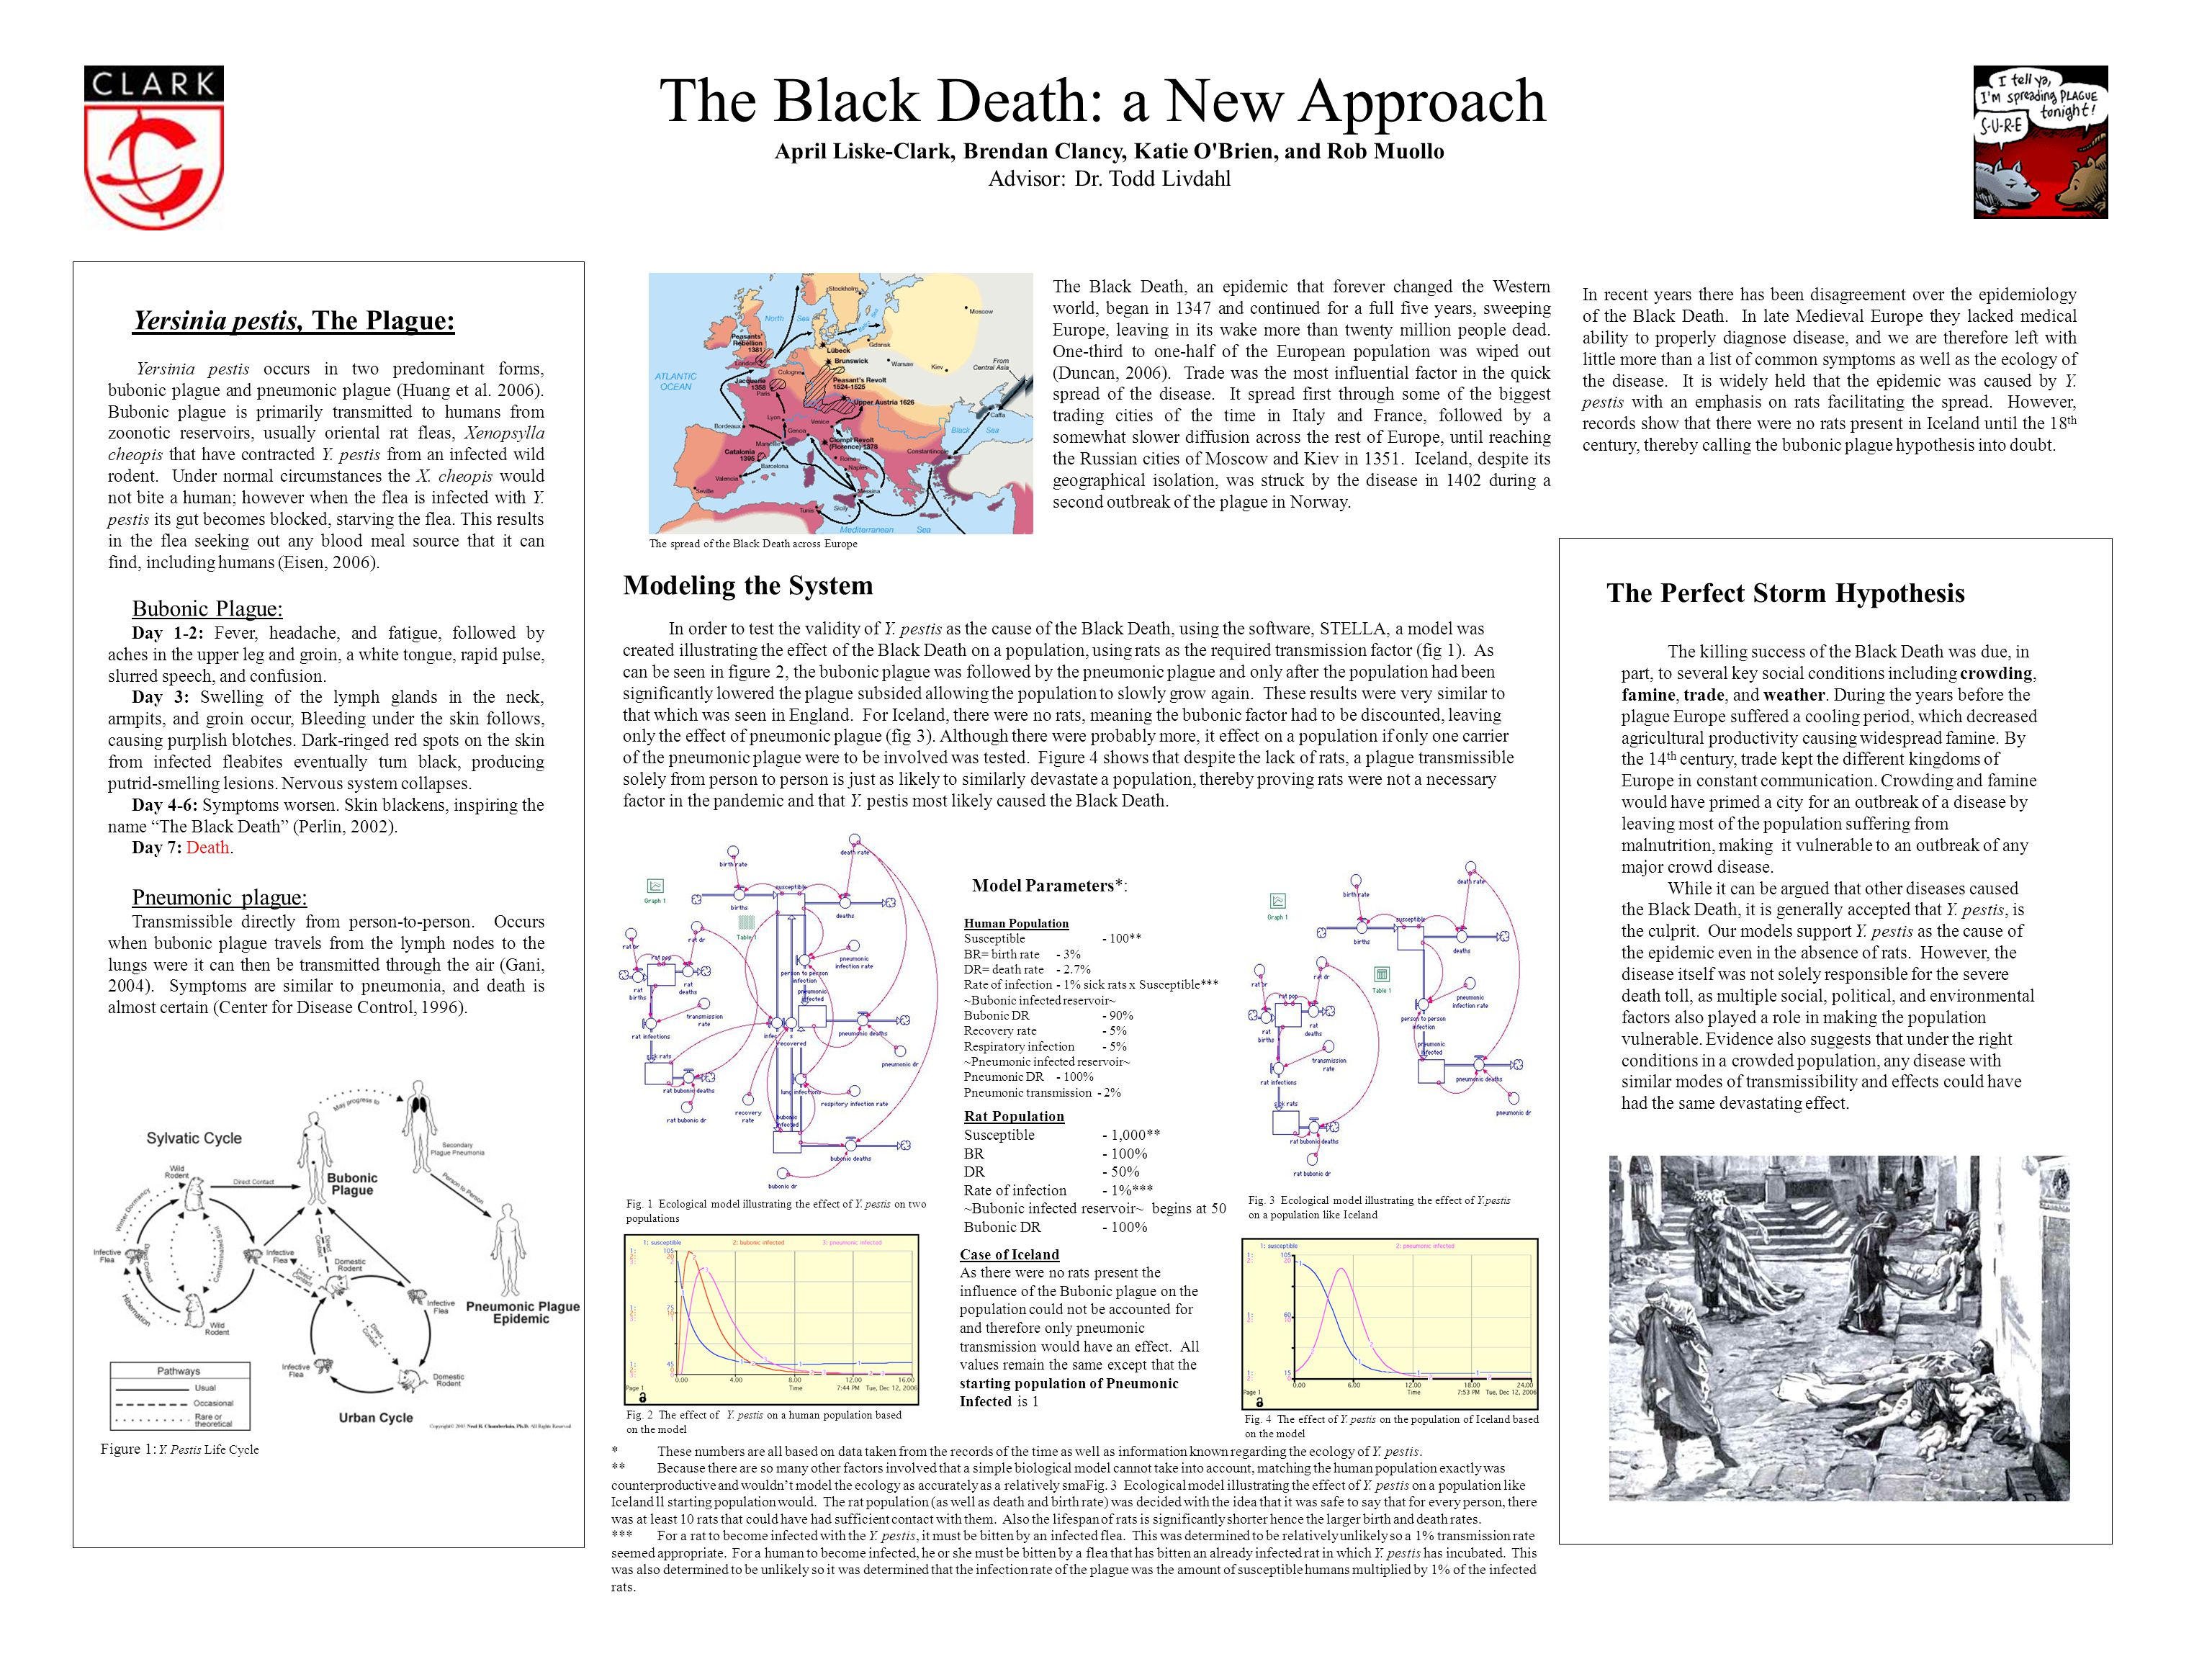 The Black Death: a New Approach April Liske-Clark, Brendan Clancy, Katie O Brien, and Rob Muollo Advisor: Dr.